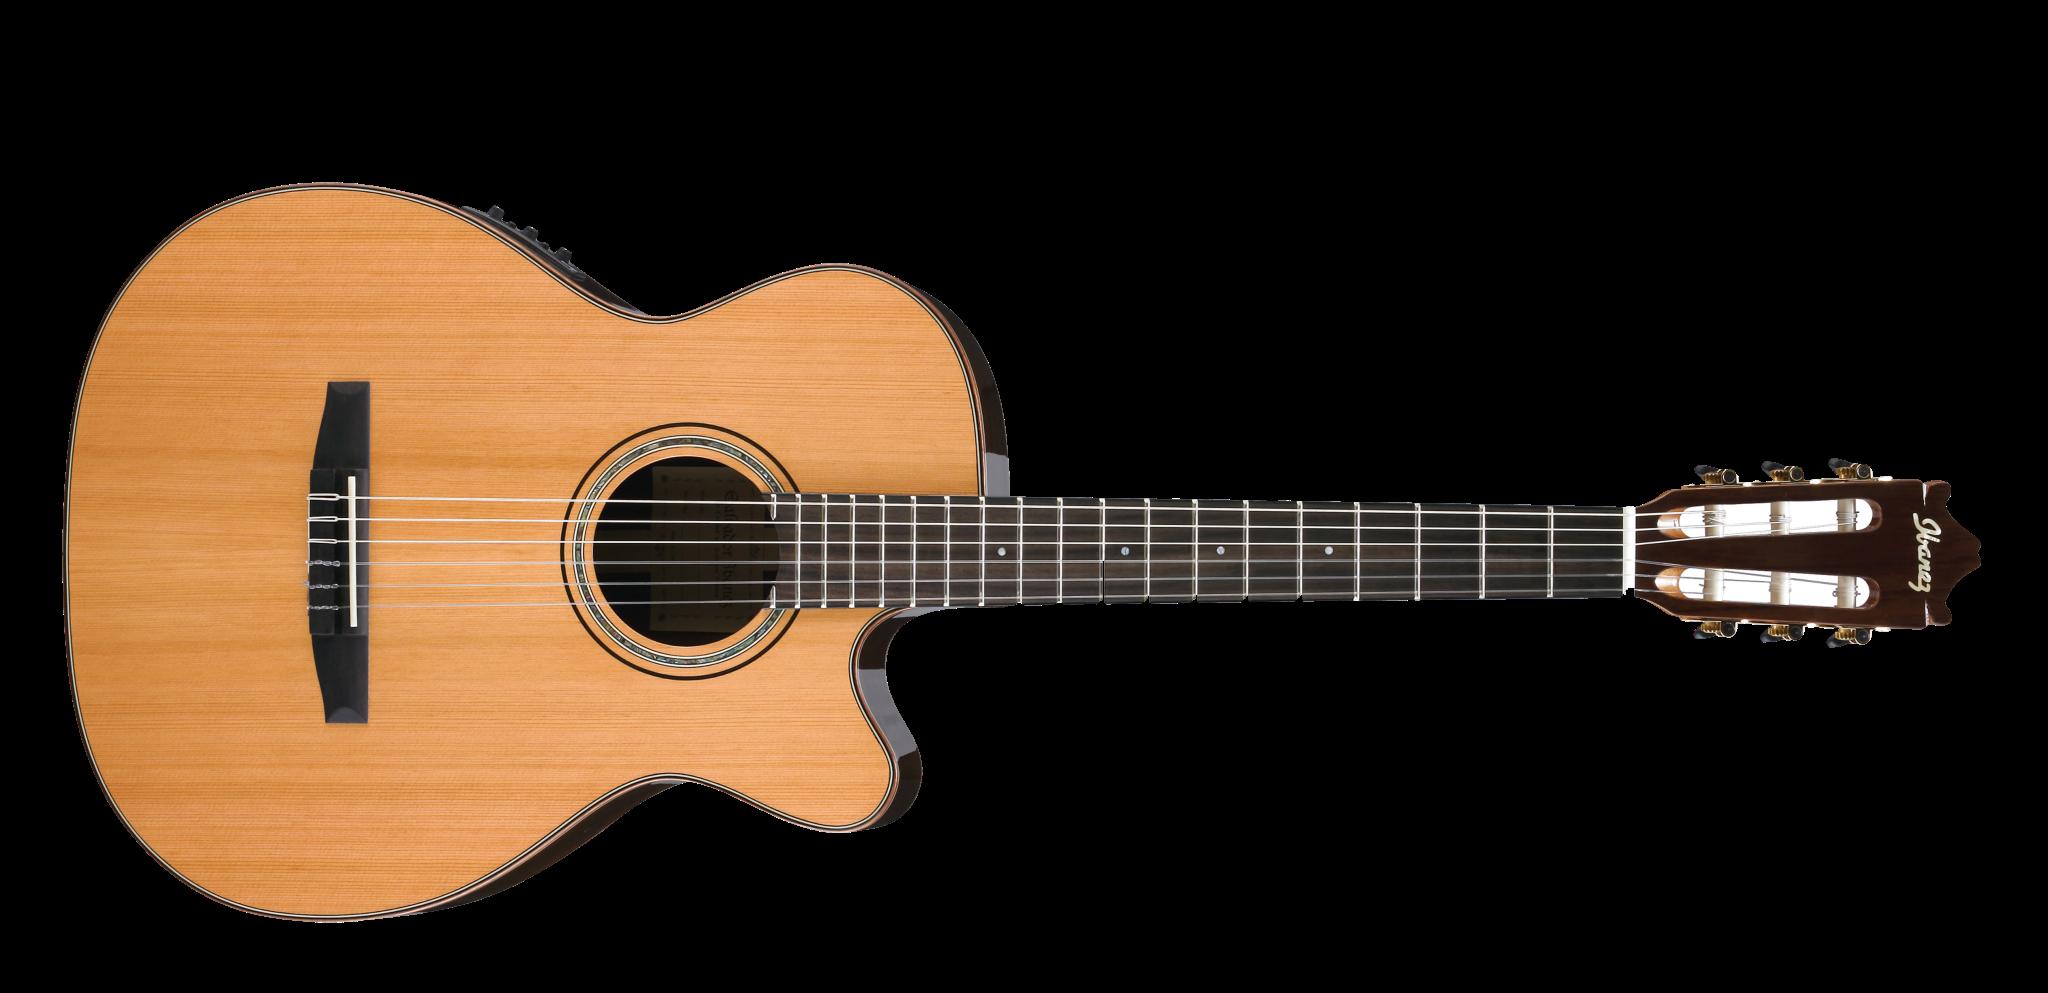 Acoustic HD PNG - 89262